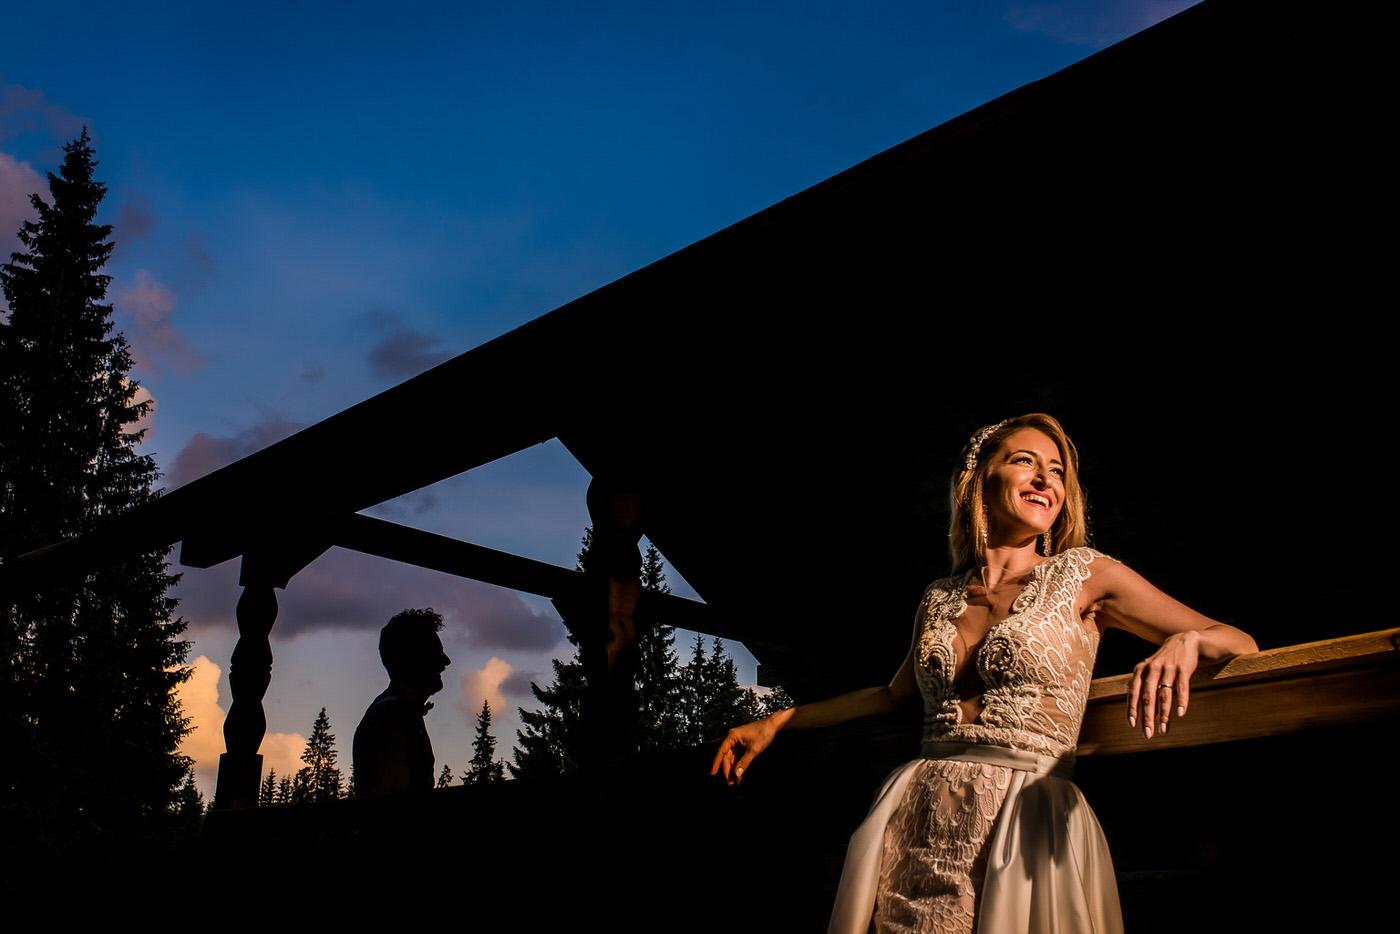 fotografii de nunta creative 1